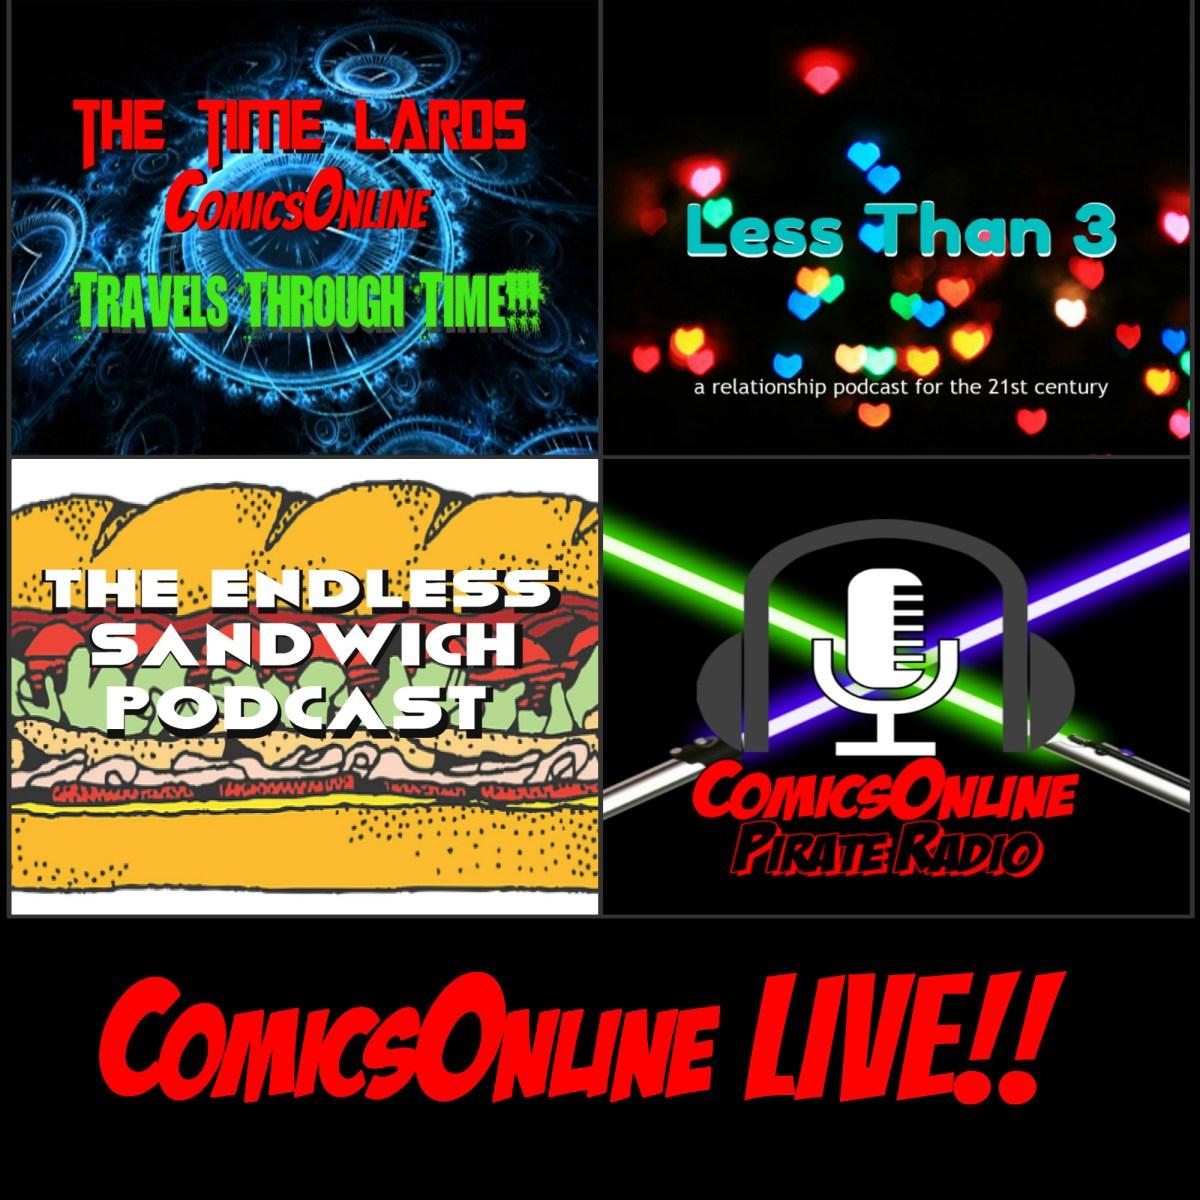 ComicsOnline Live!